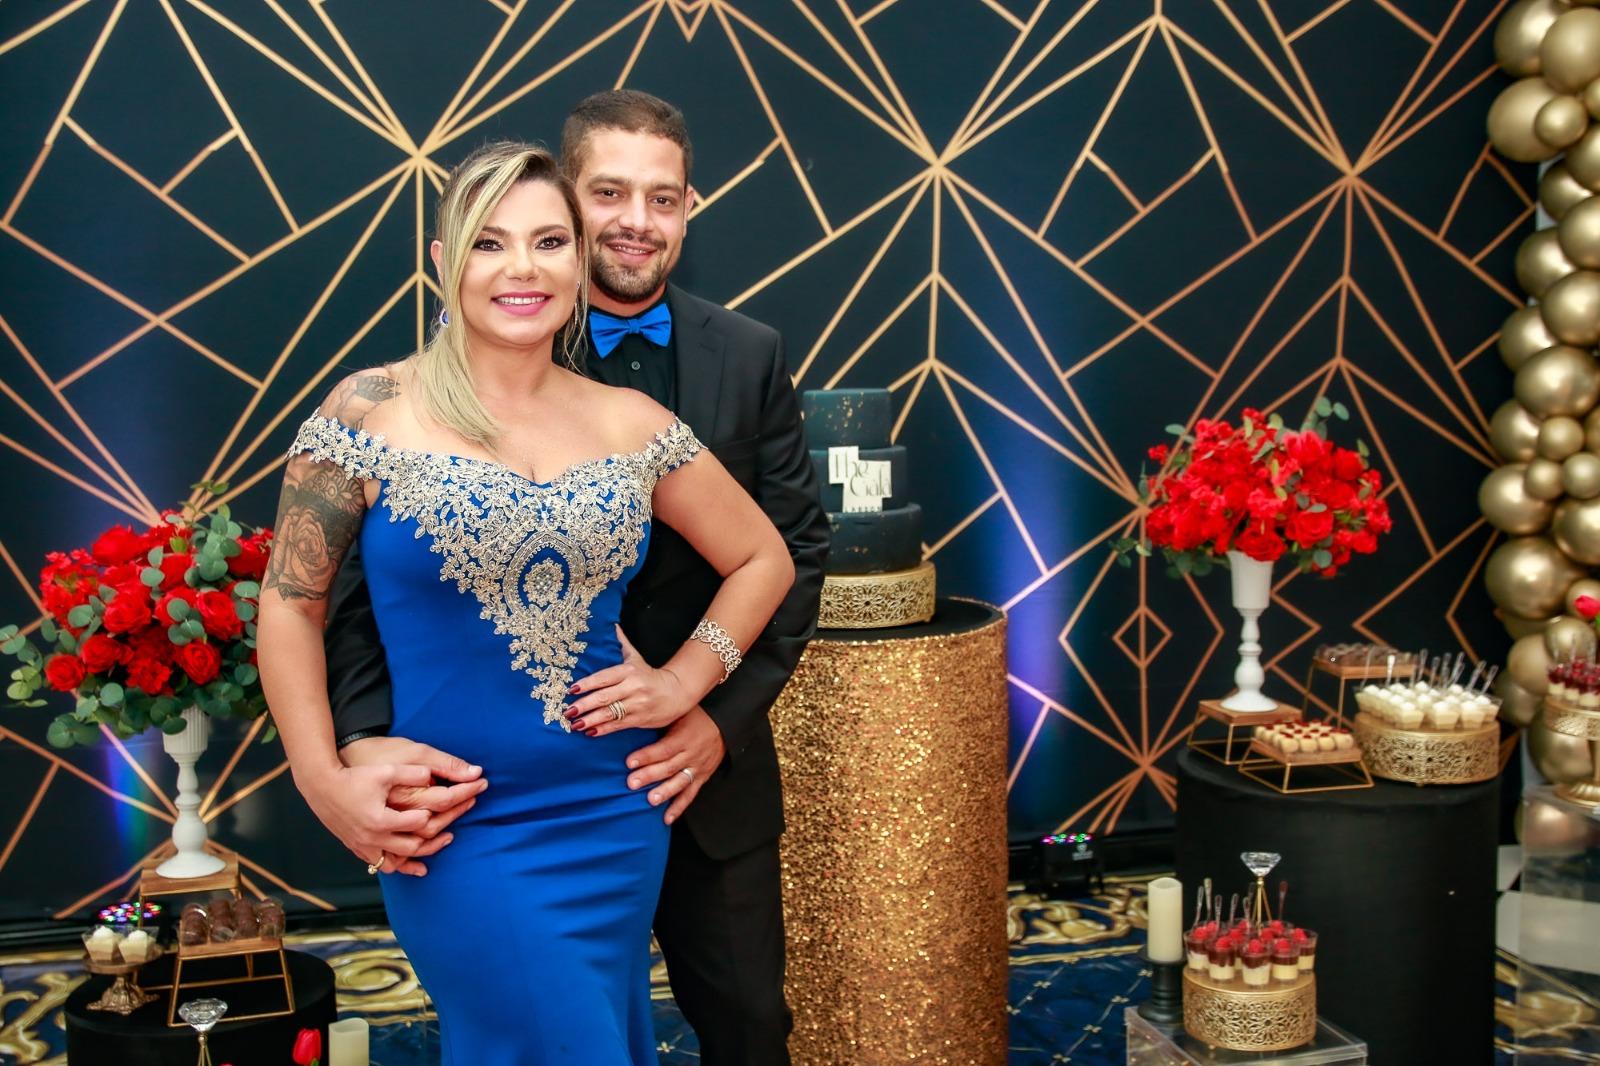 'The Gala Larson' celebra sucesso da 'Larson Accounting Group' com entrega de troféus